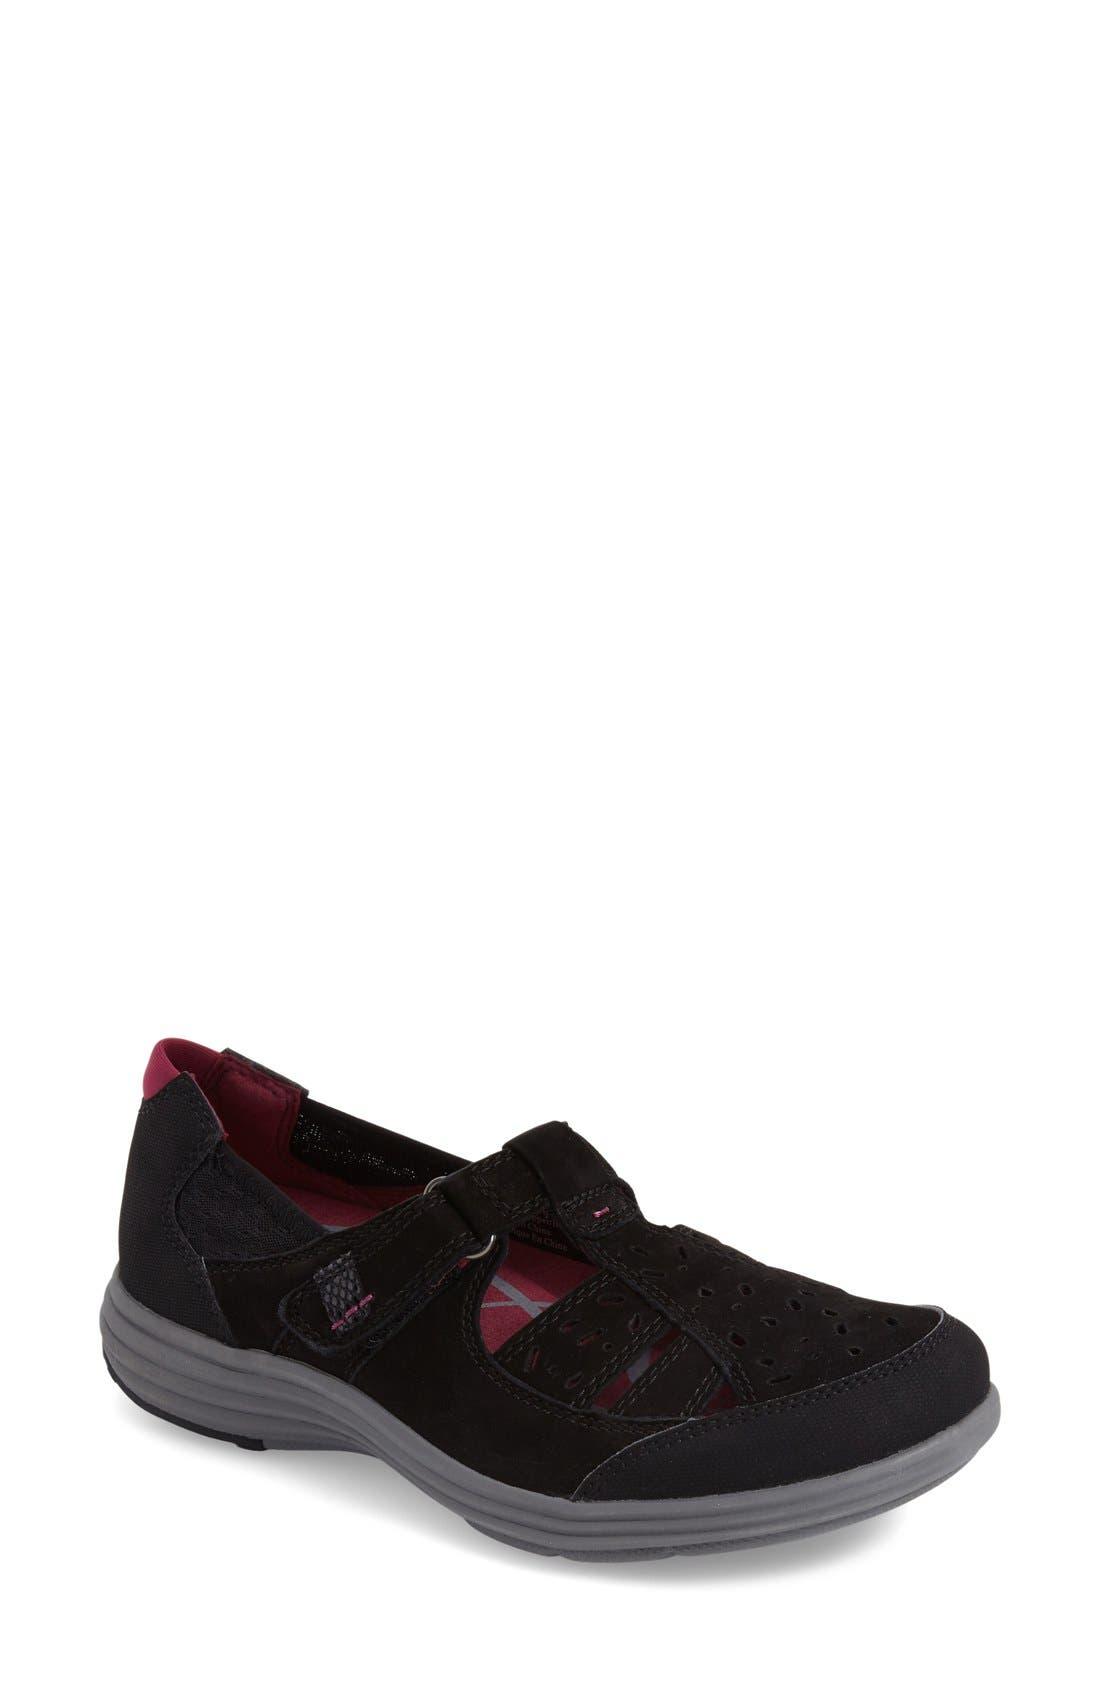 Main Image - Aravon 'Barbara' Sneaker (Women)